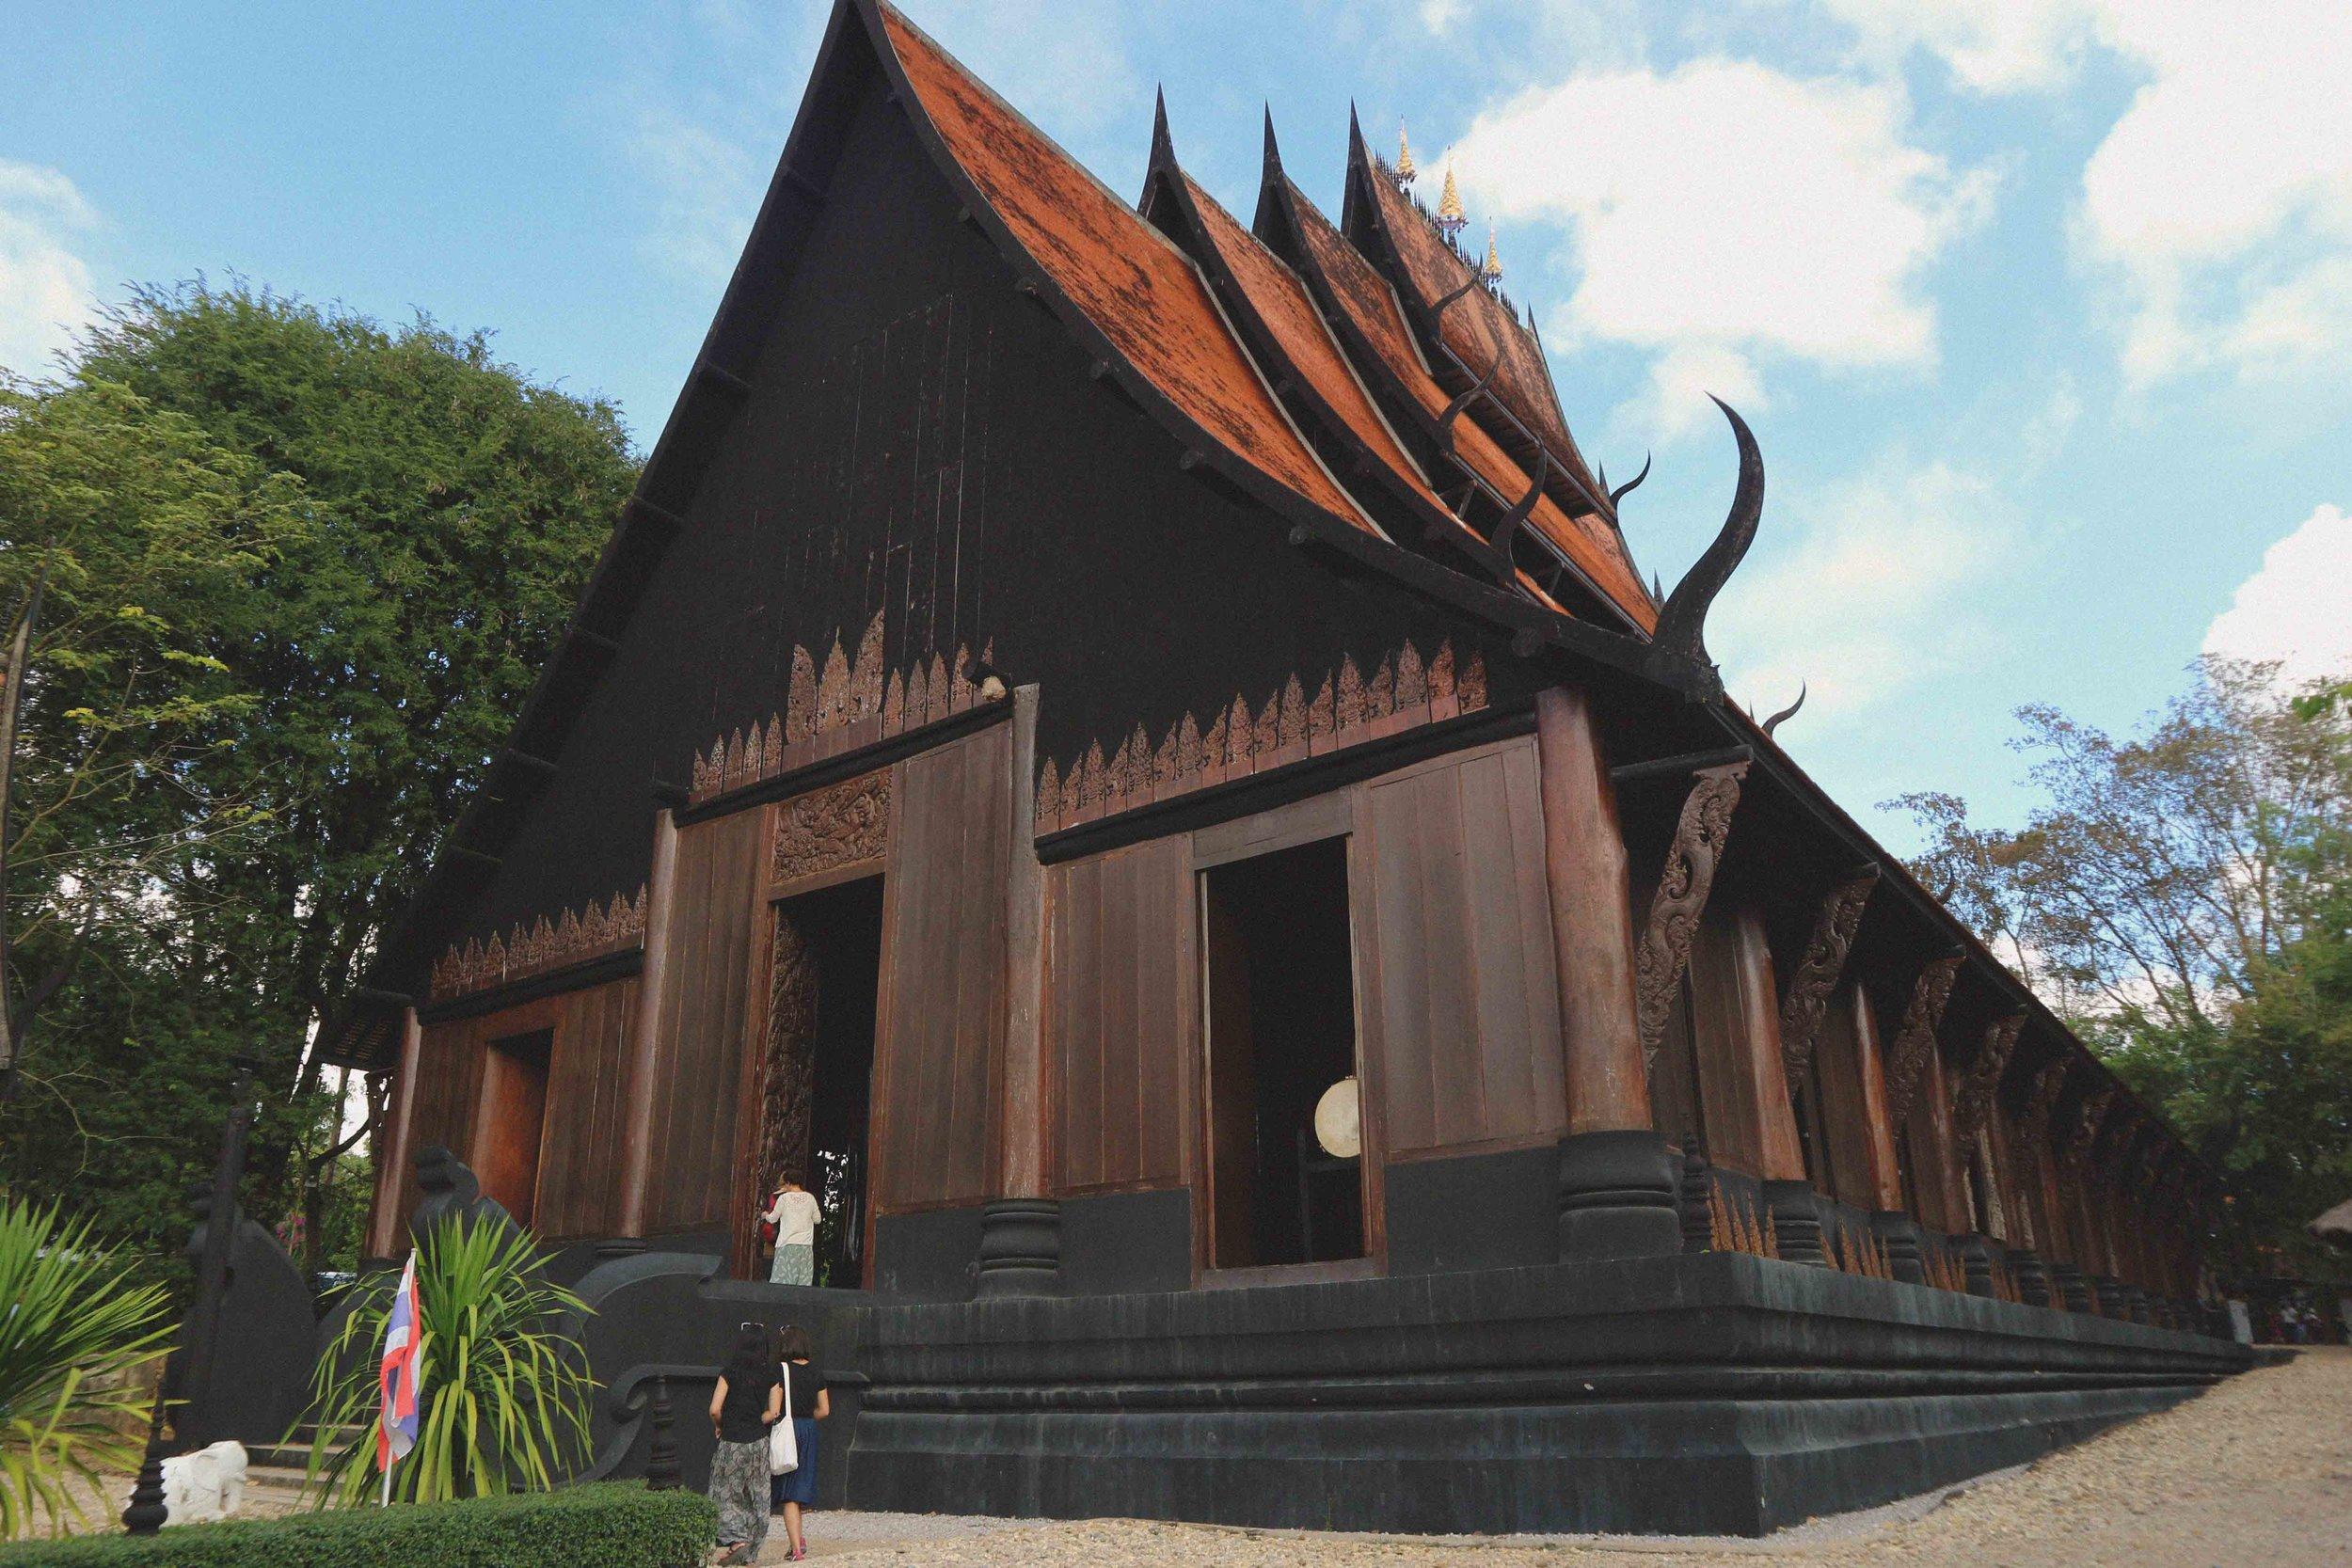 Thawan Duchanee's Black Temple